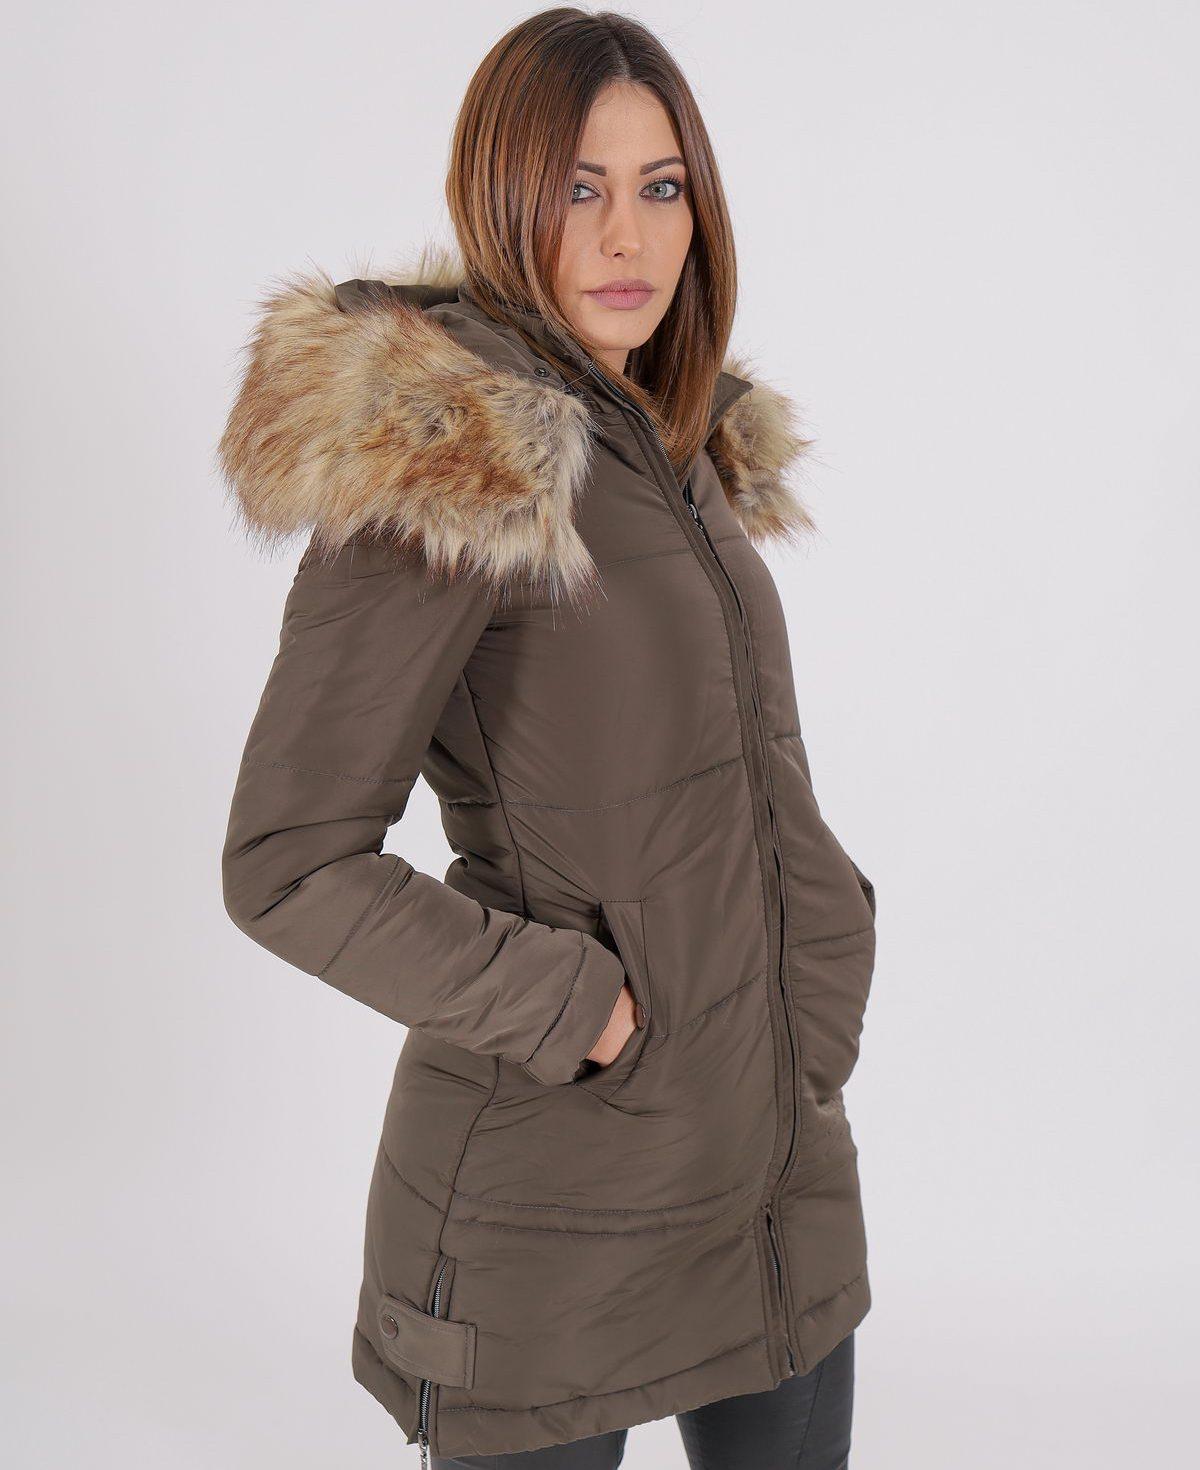 Ženska jakna ForteFashion model D8